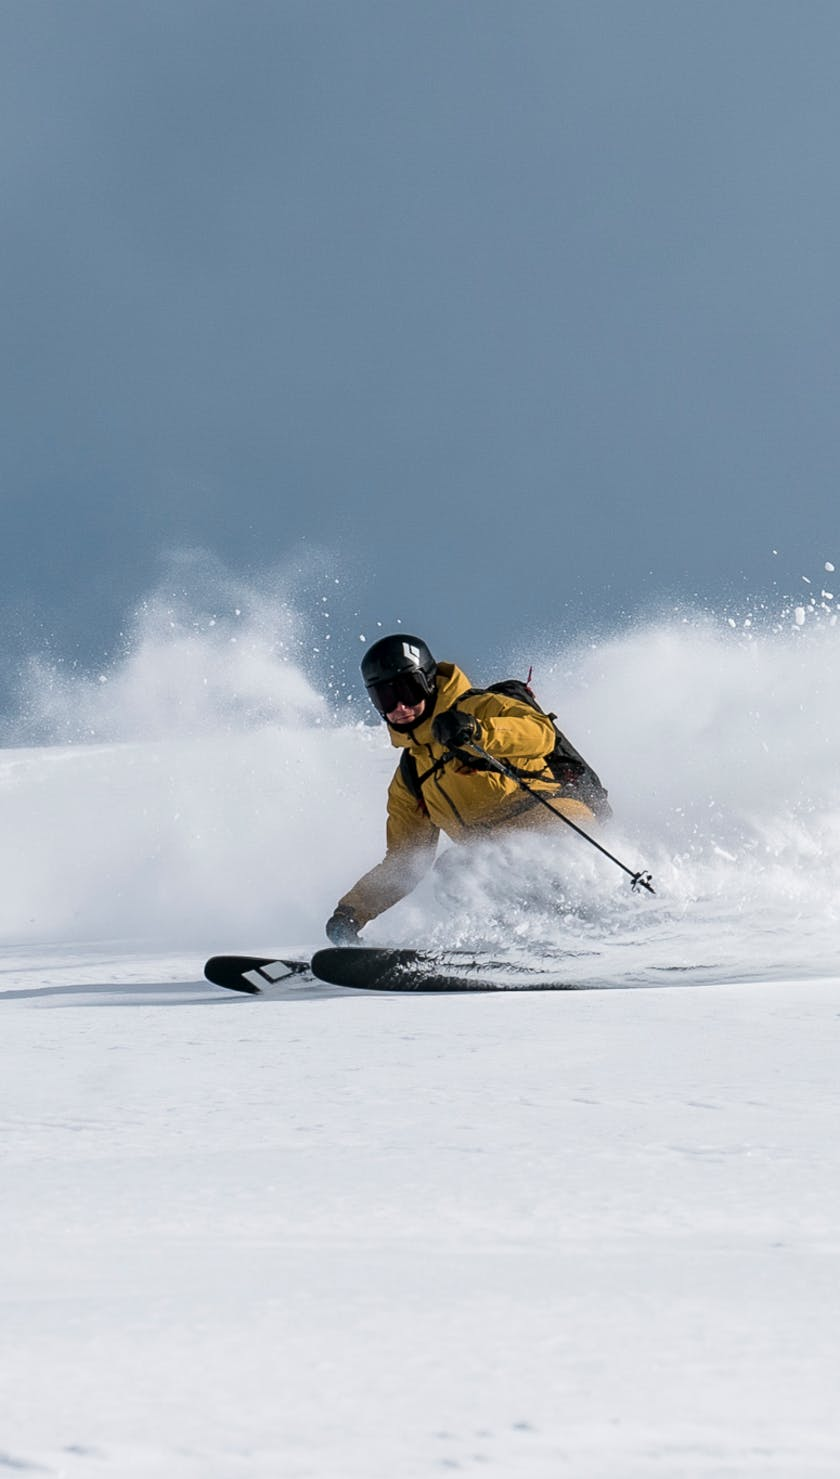 Black Diamond Athlete Tobin Seagel skiing the Impulse 98 in British Columbia, Canada.